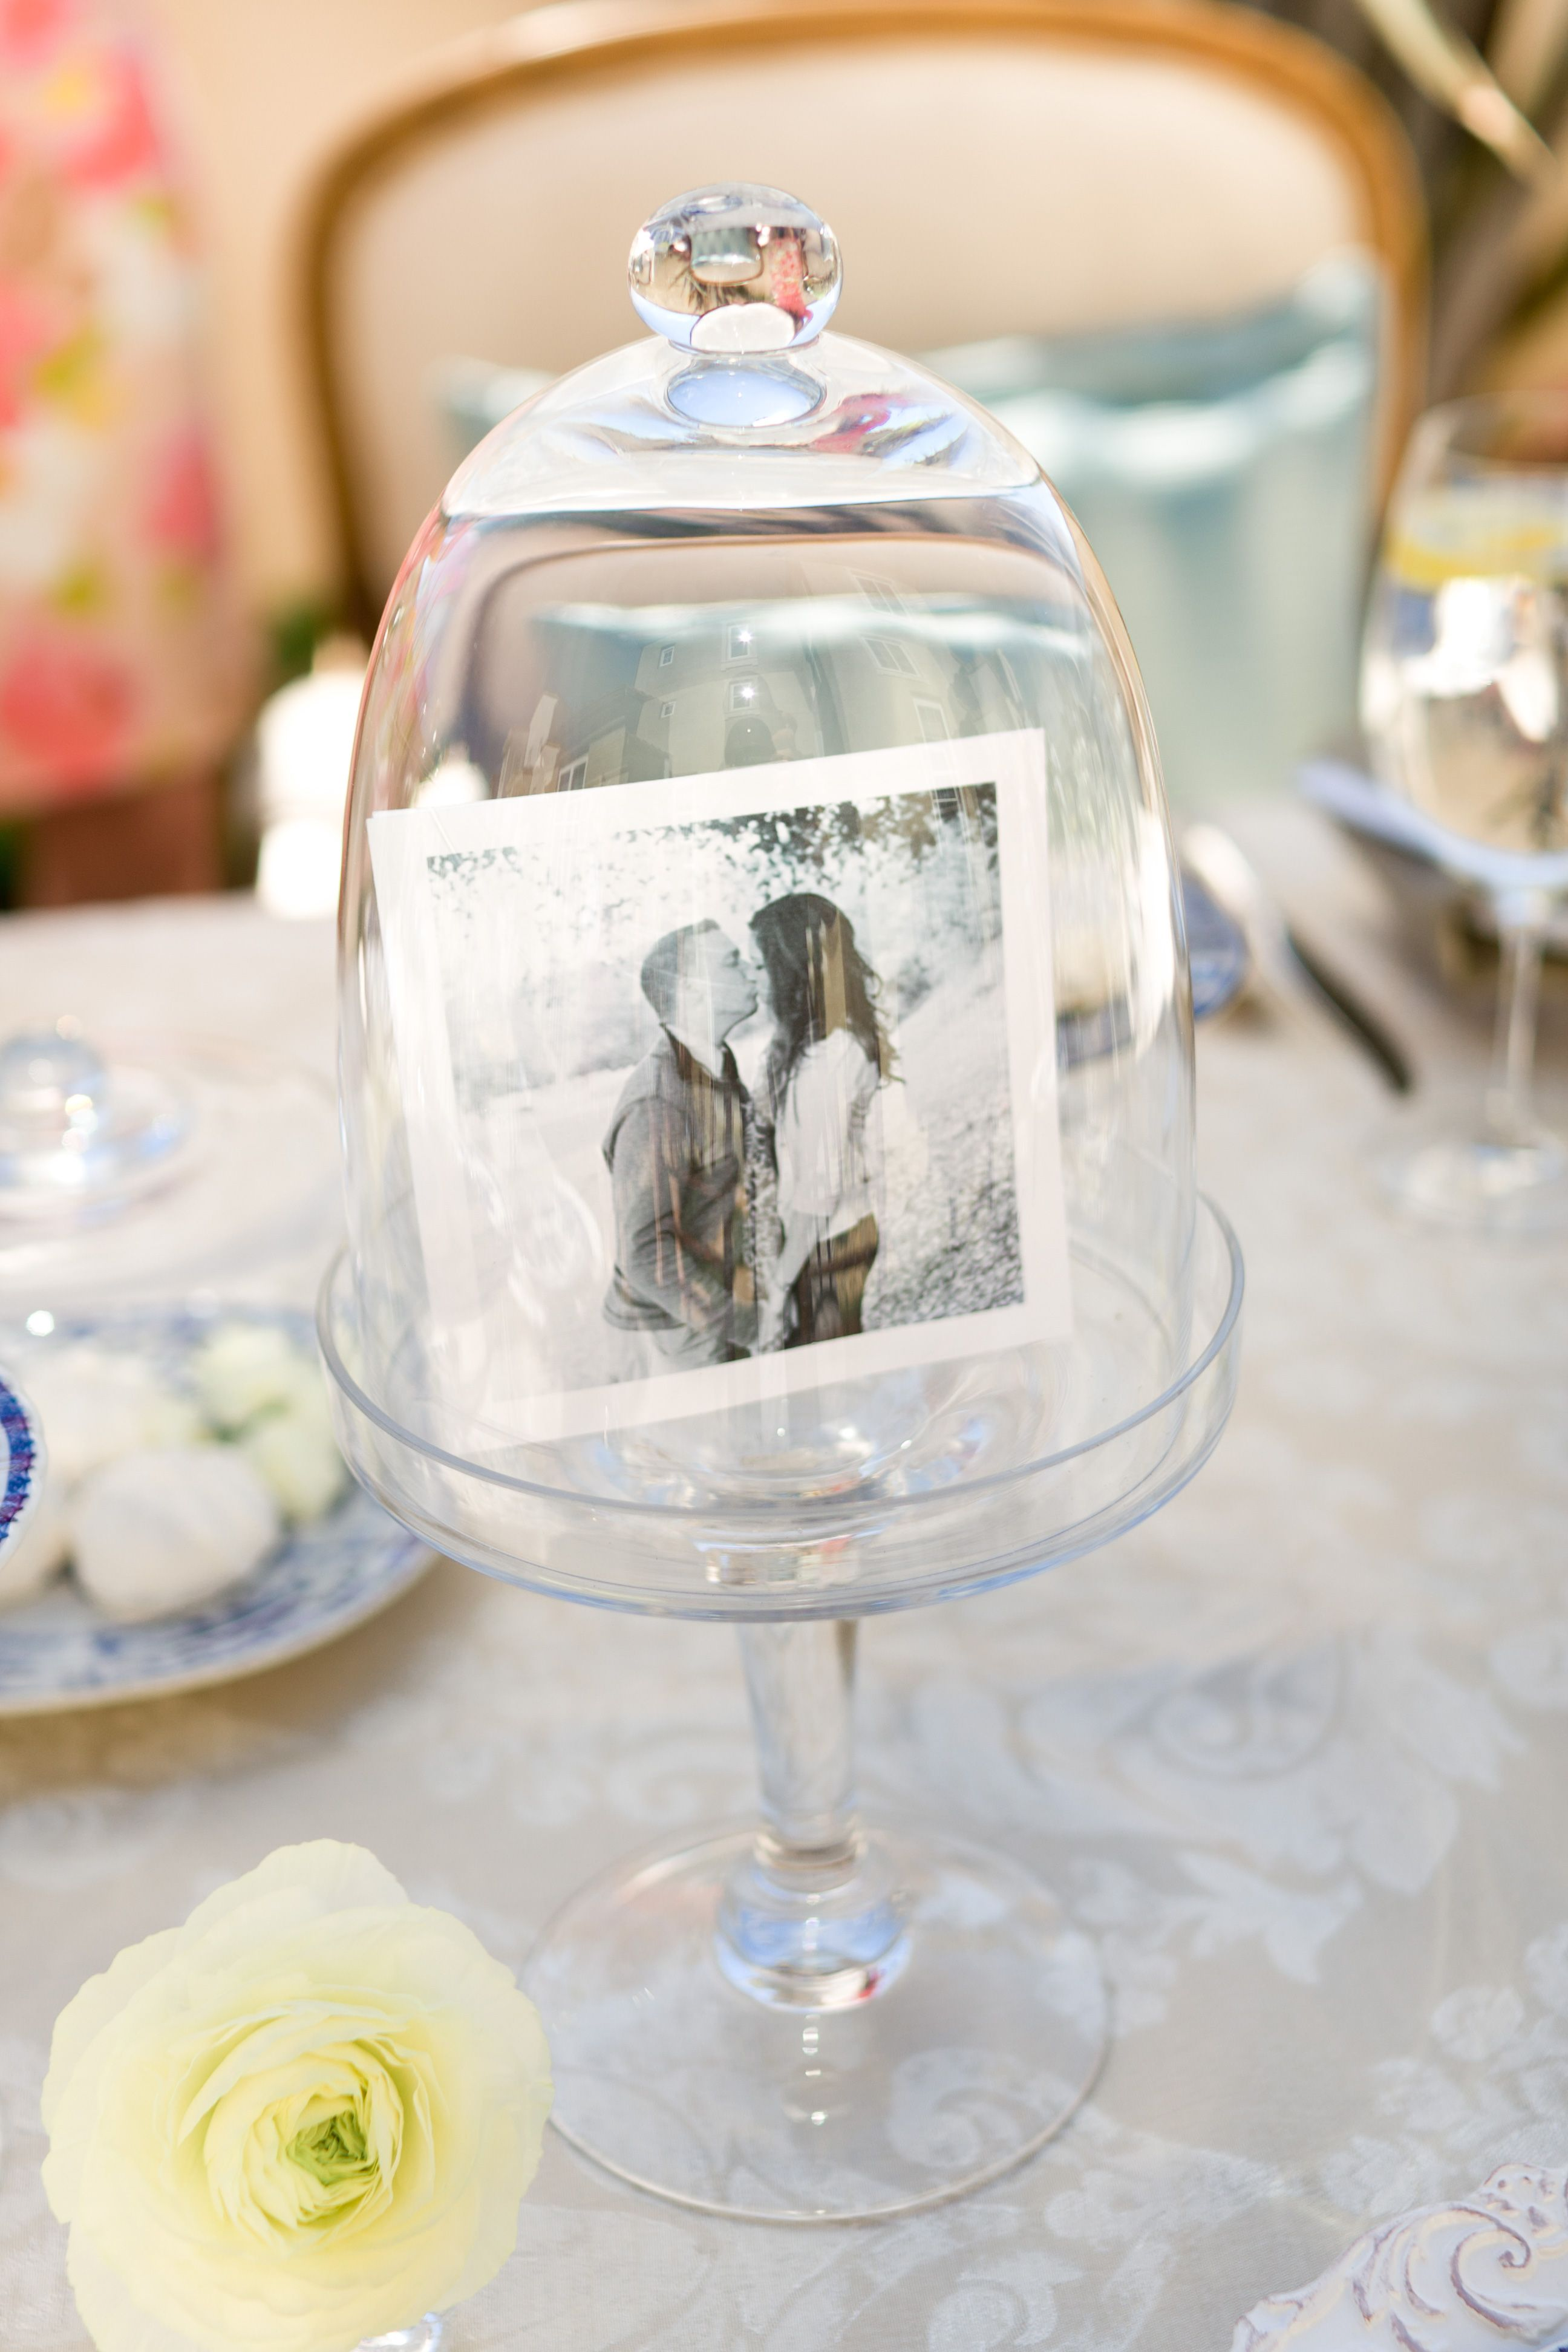 Classic Parisian Themed Bridal Shower | Pinterest | Shower ...